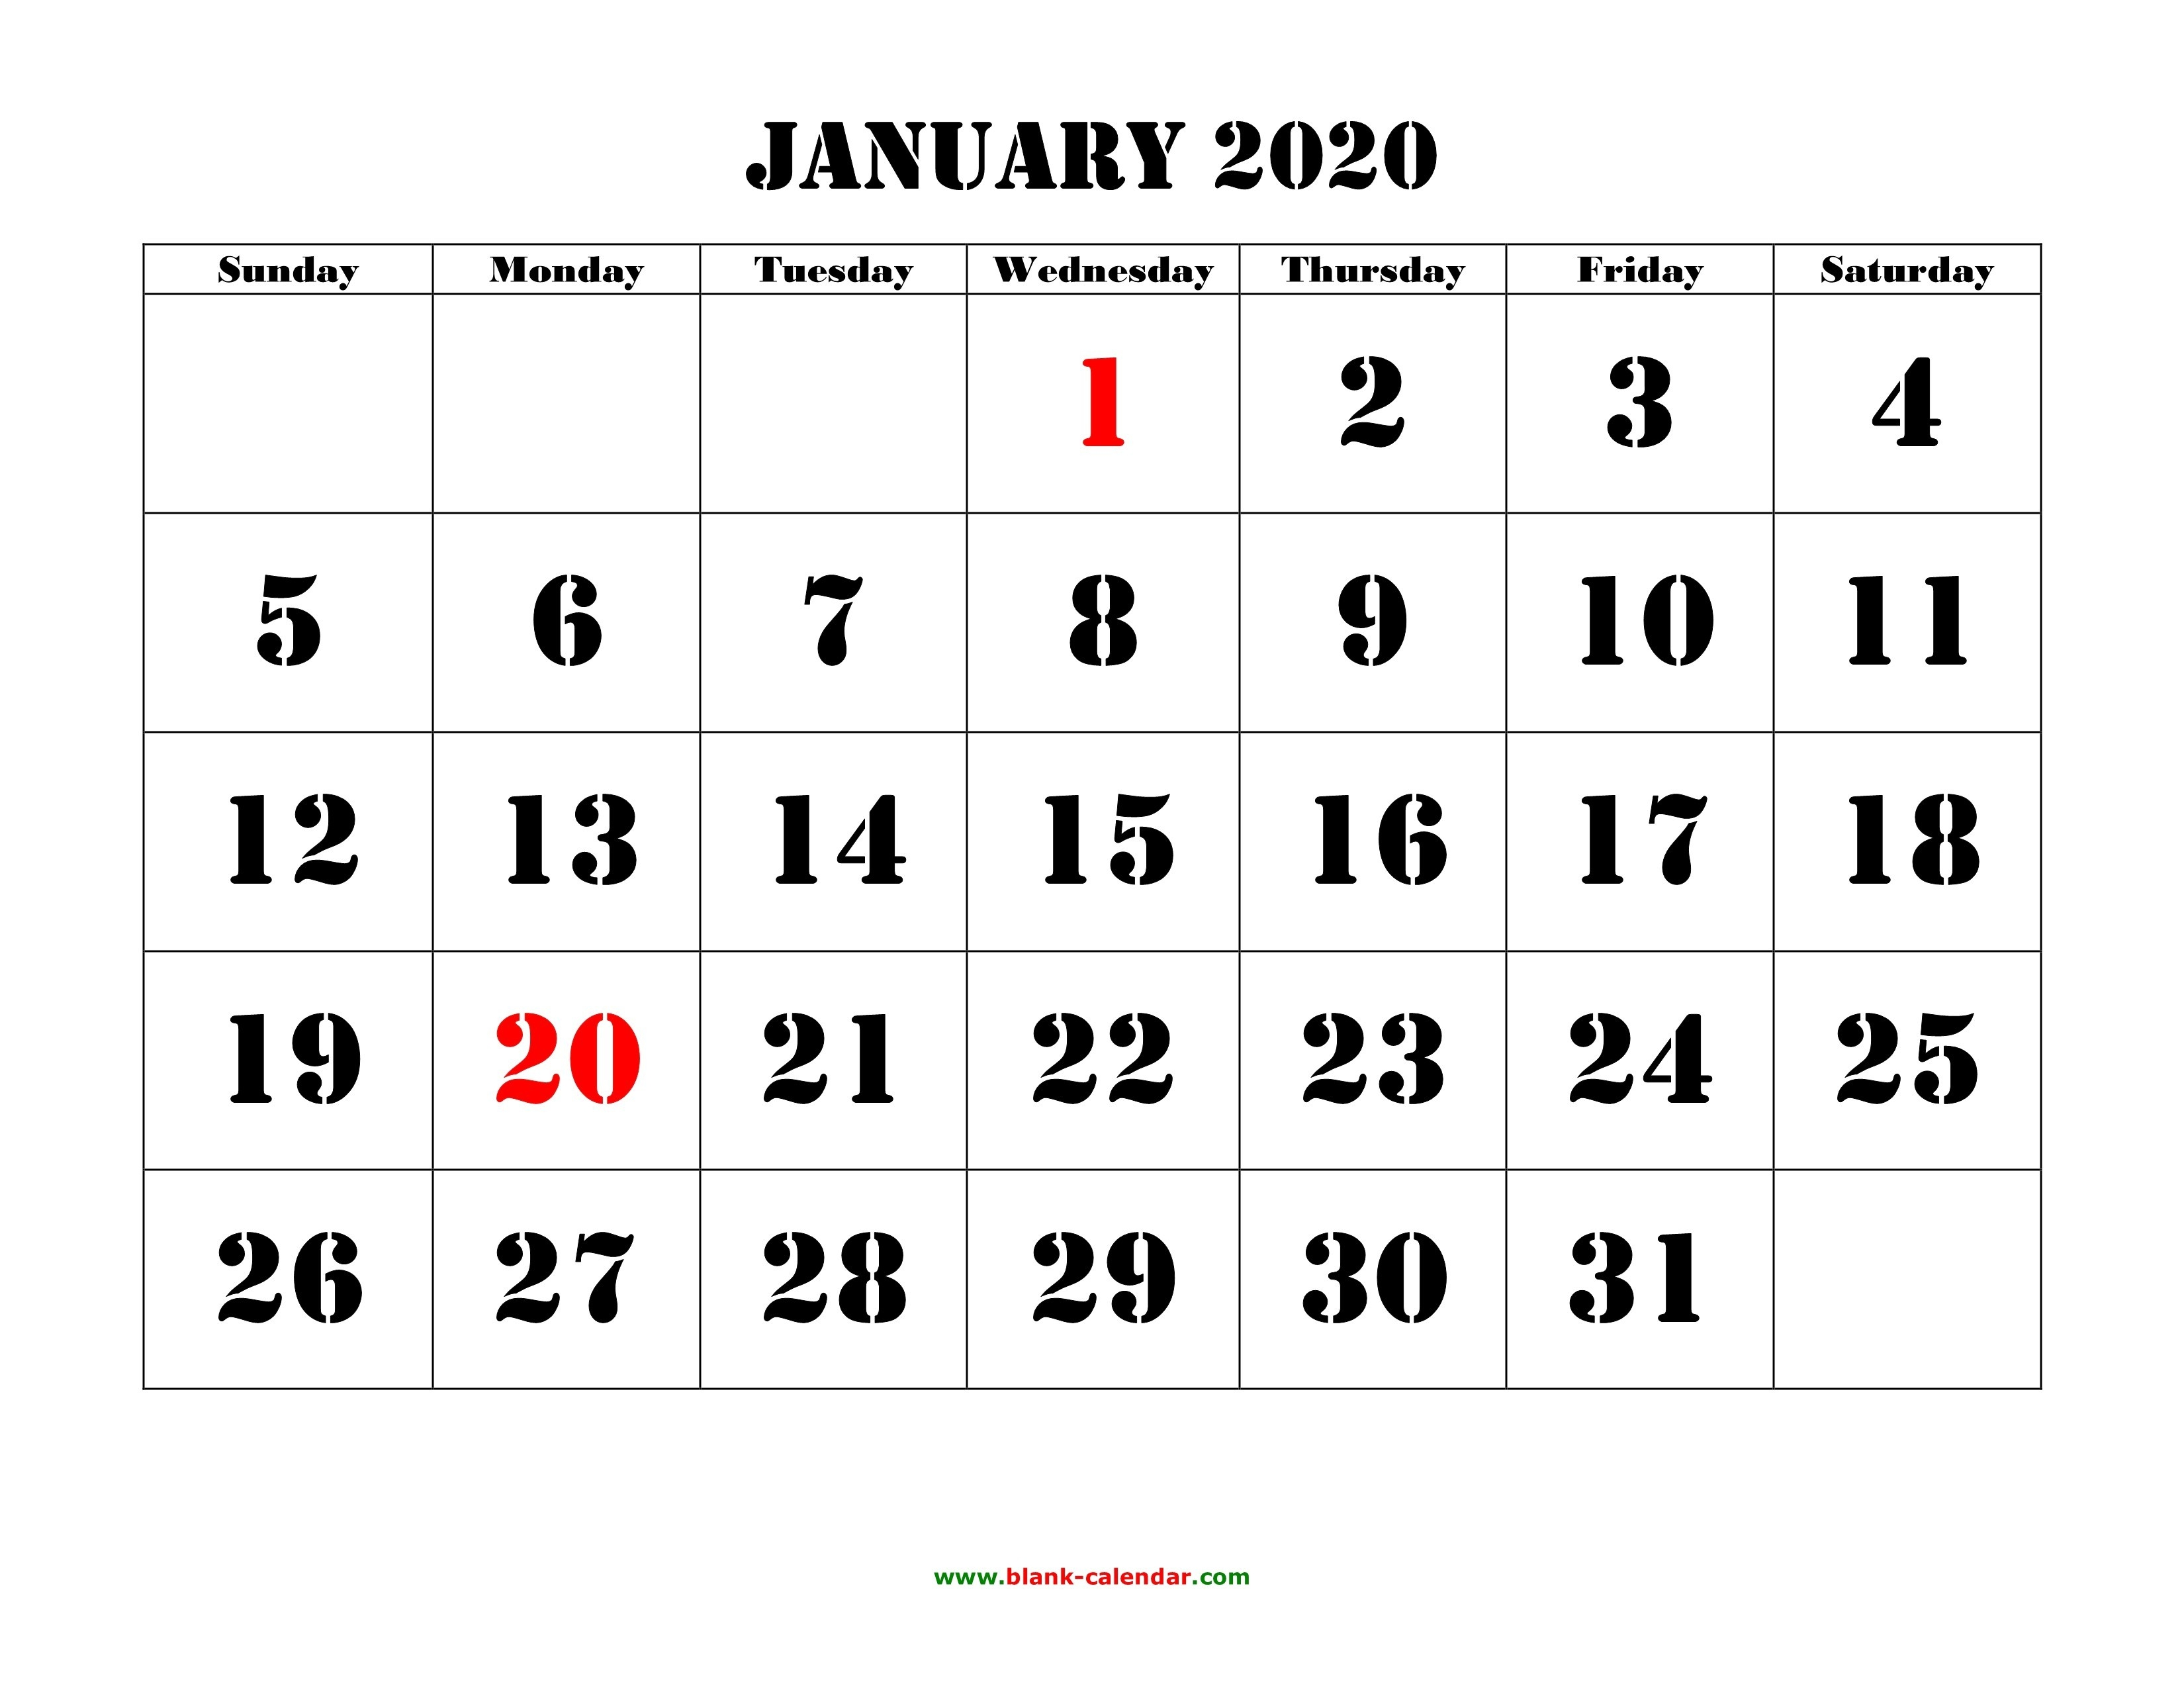 Printable January 2020 Calendar Large Font | Jcreview-Moon Calendar January 2020